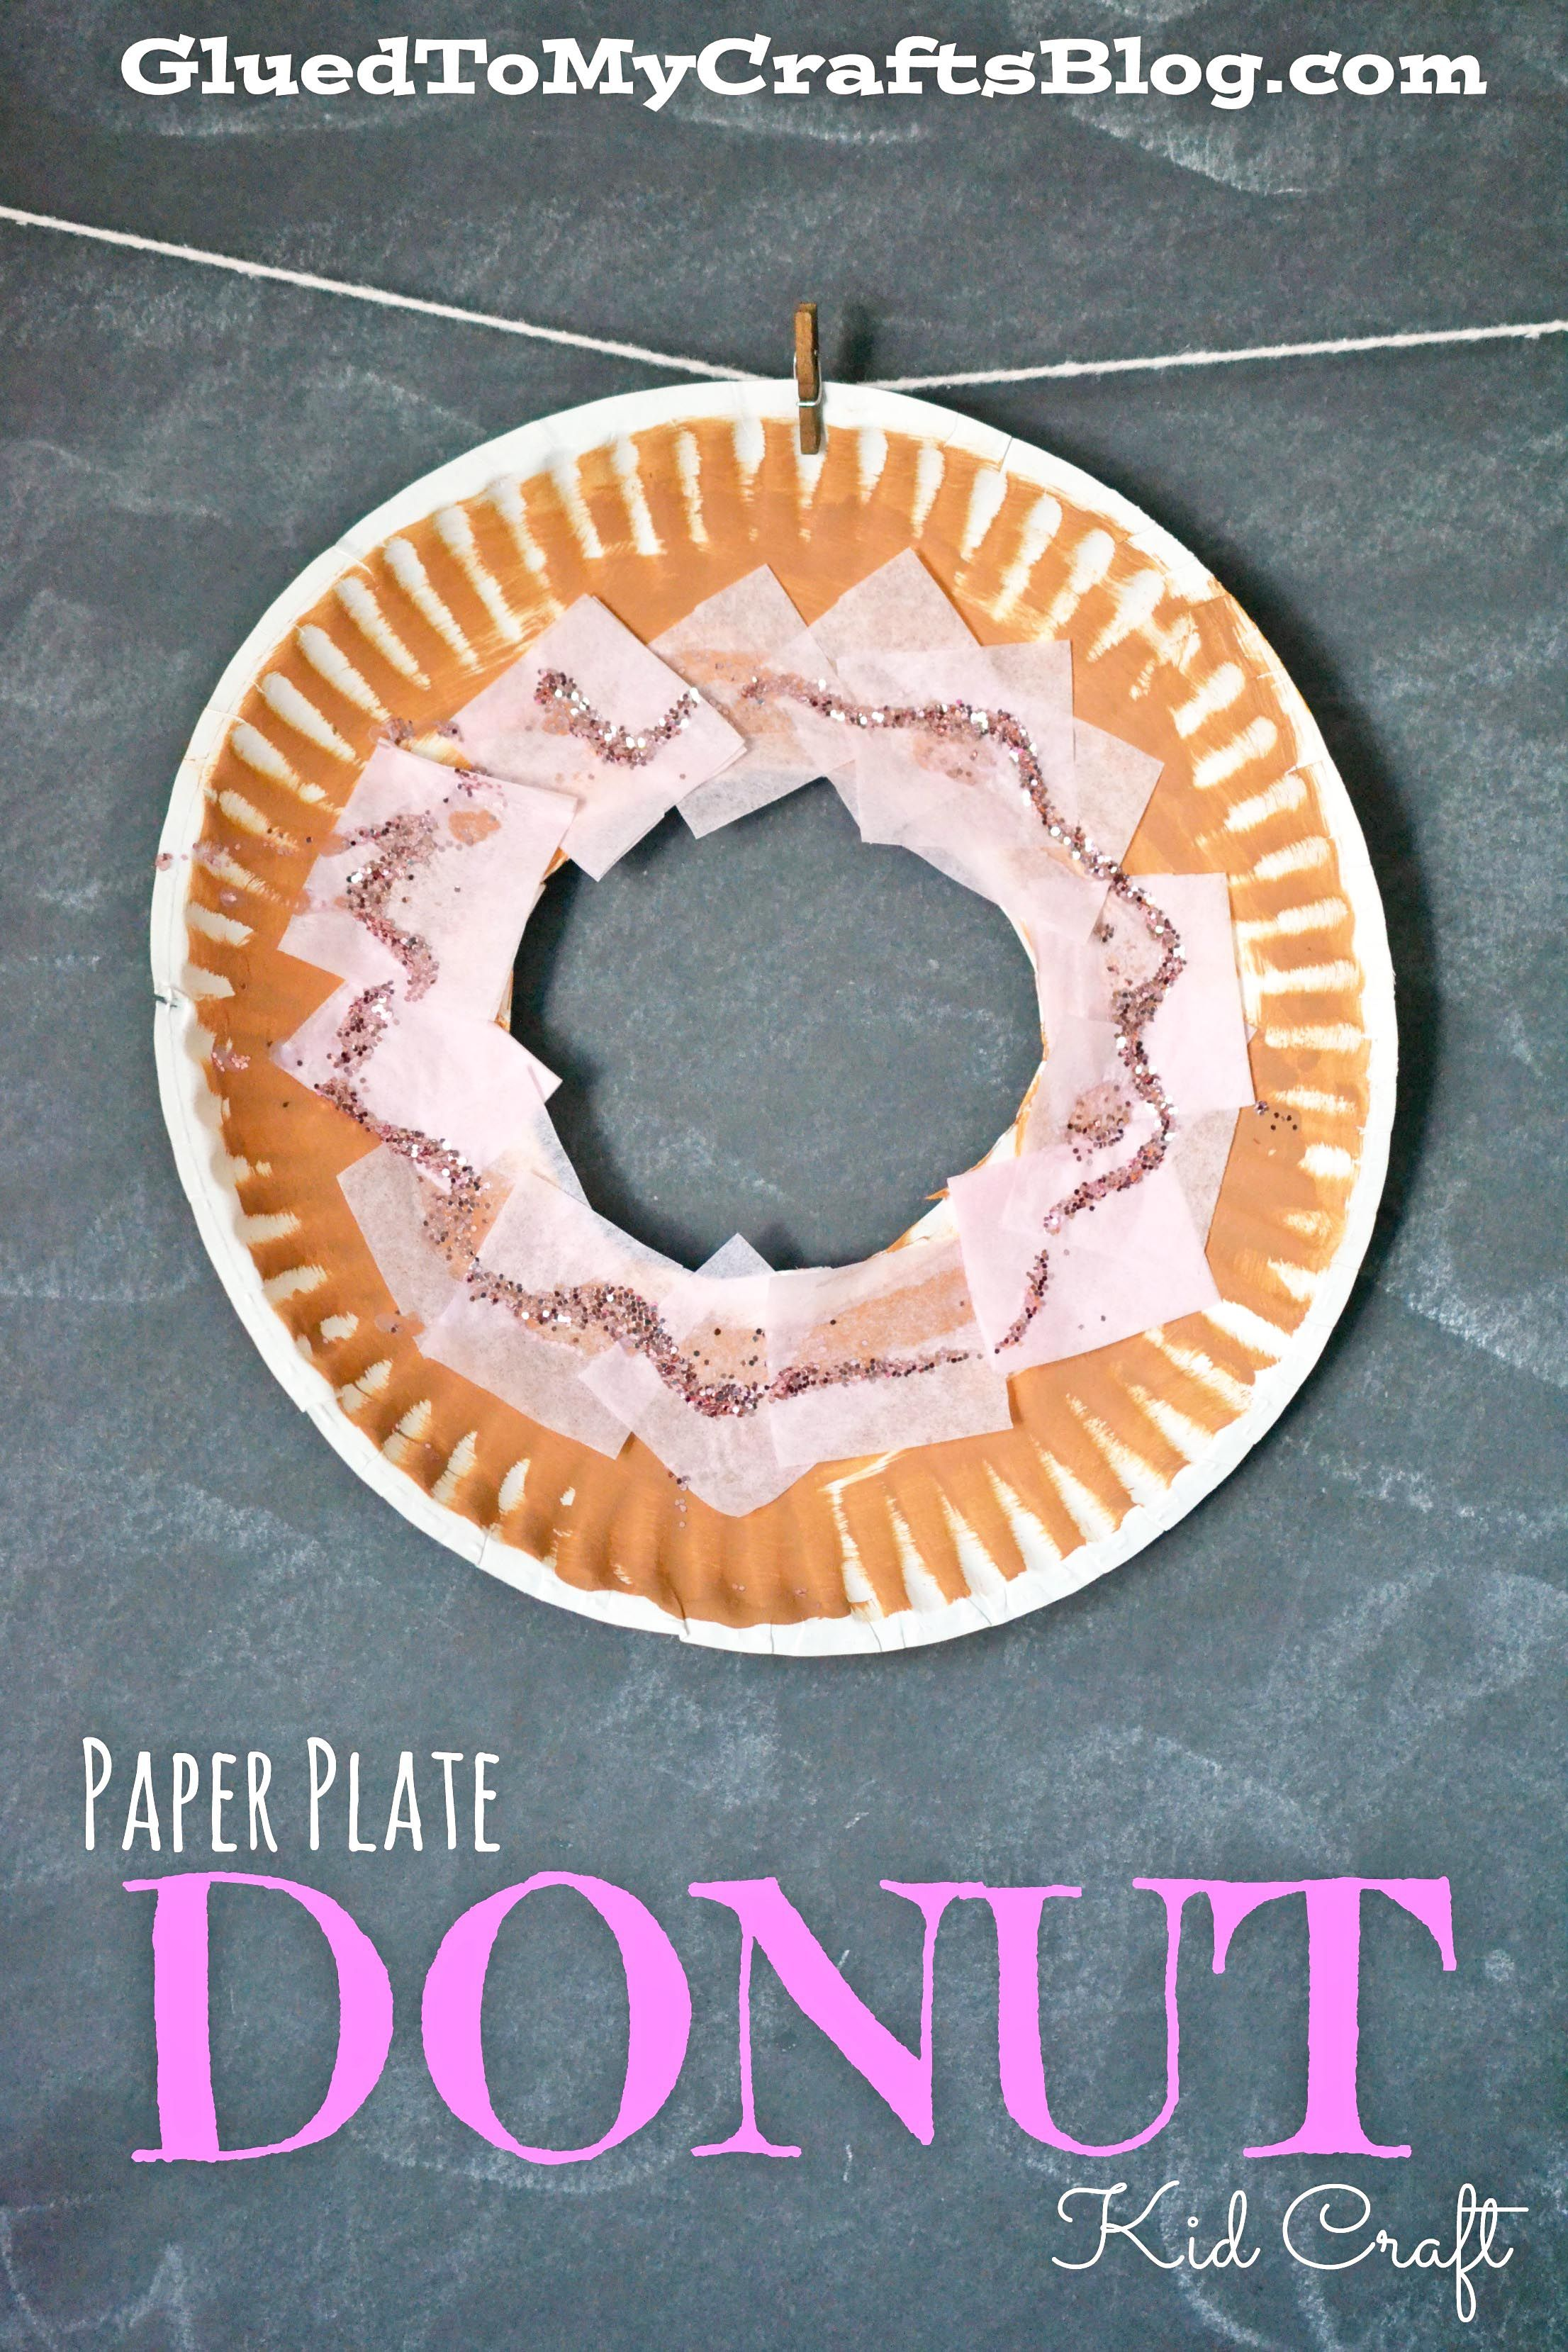 Paper Plate Donut Kid Craft